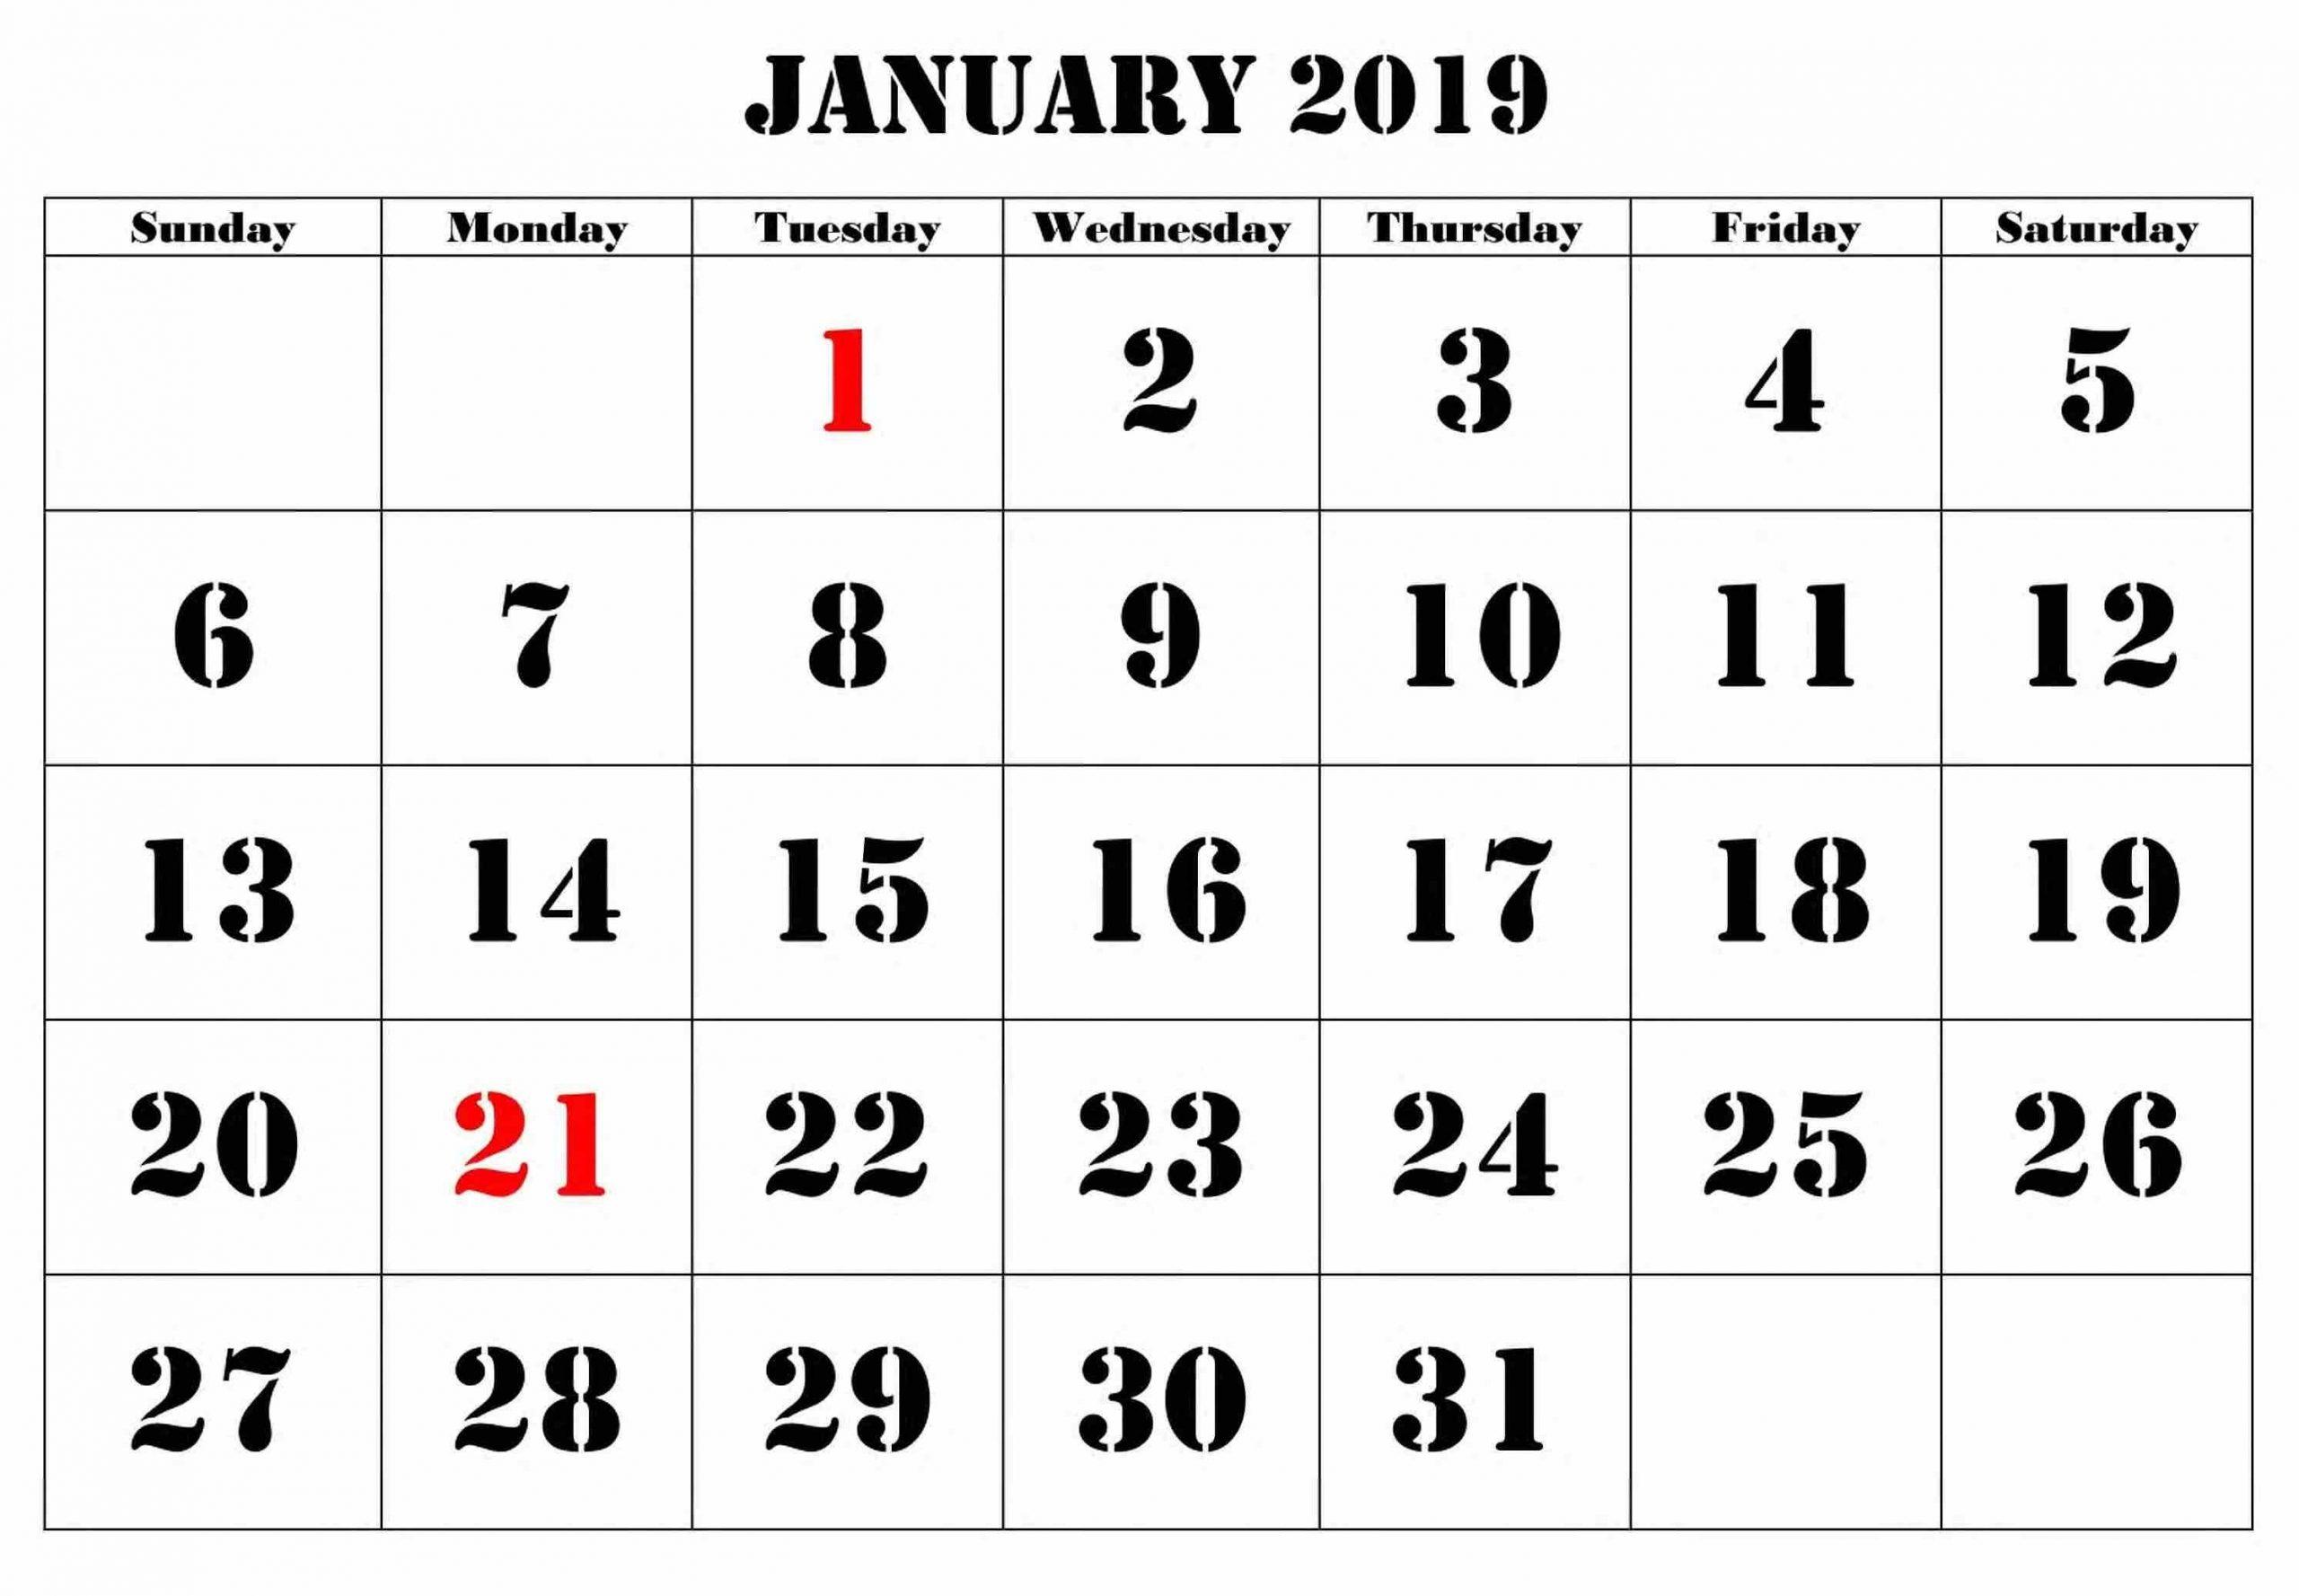 Calendar January 2019 Large Number #Januarycalendar